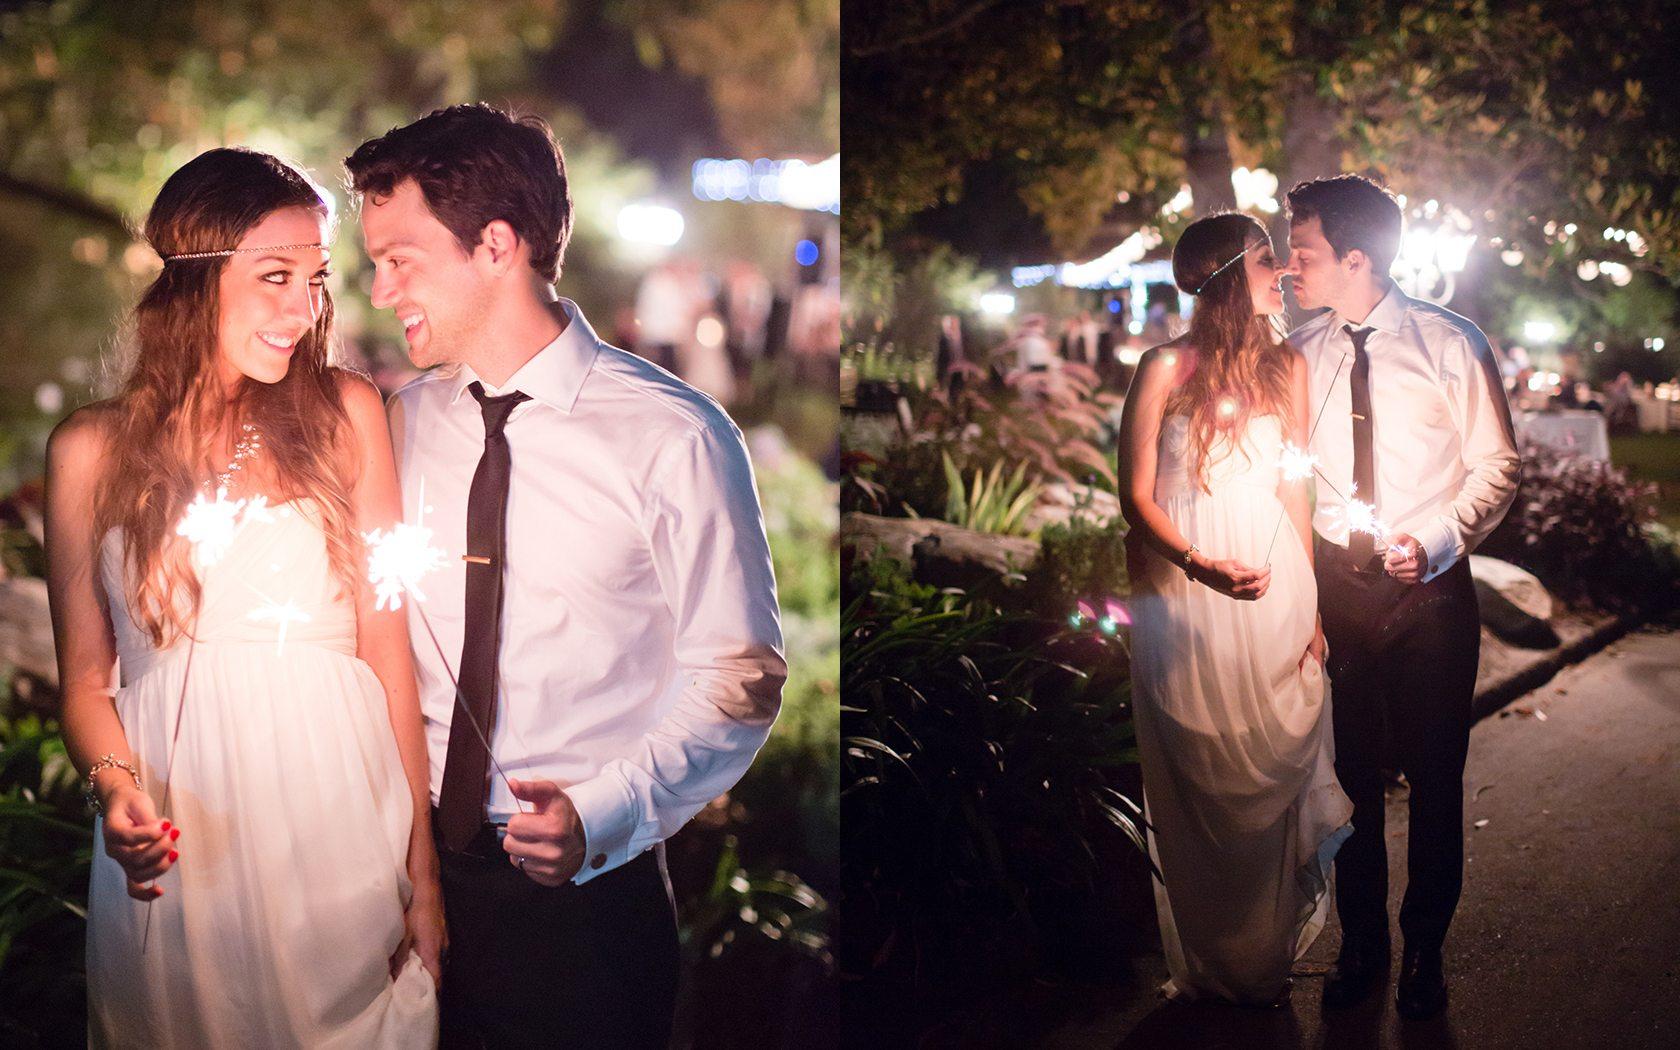 San_Diego_Botanic_Gardens_Wedding_116.jpg